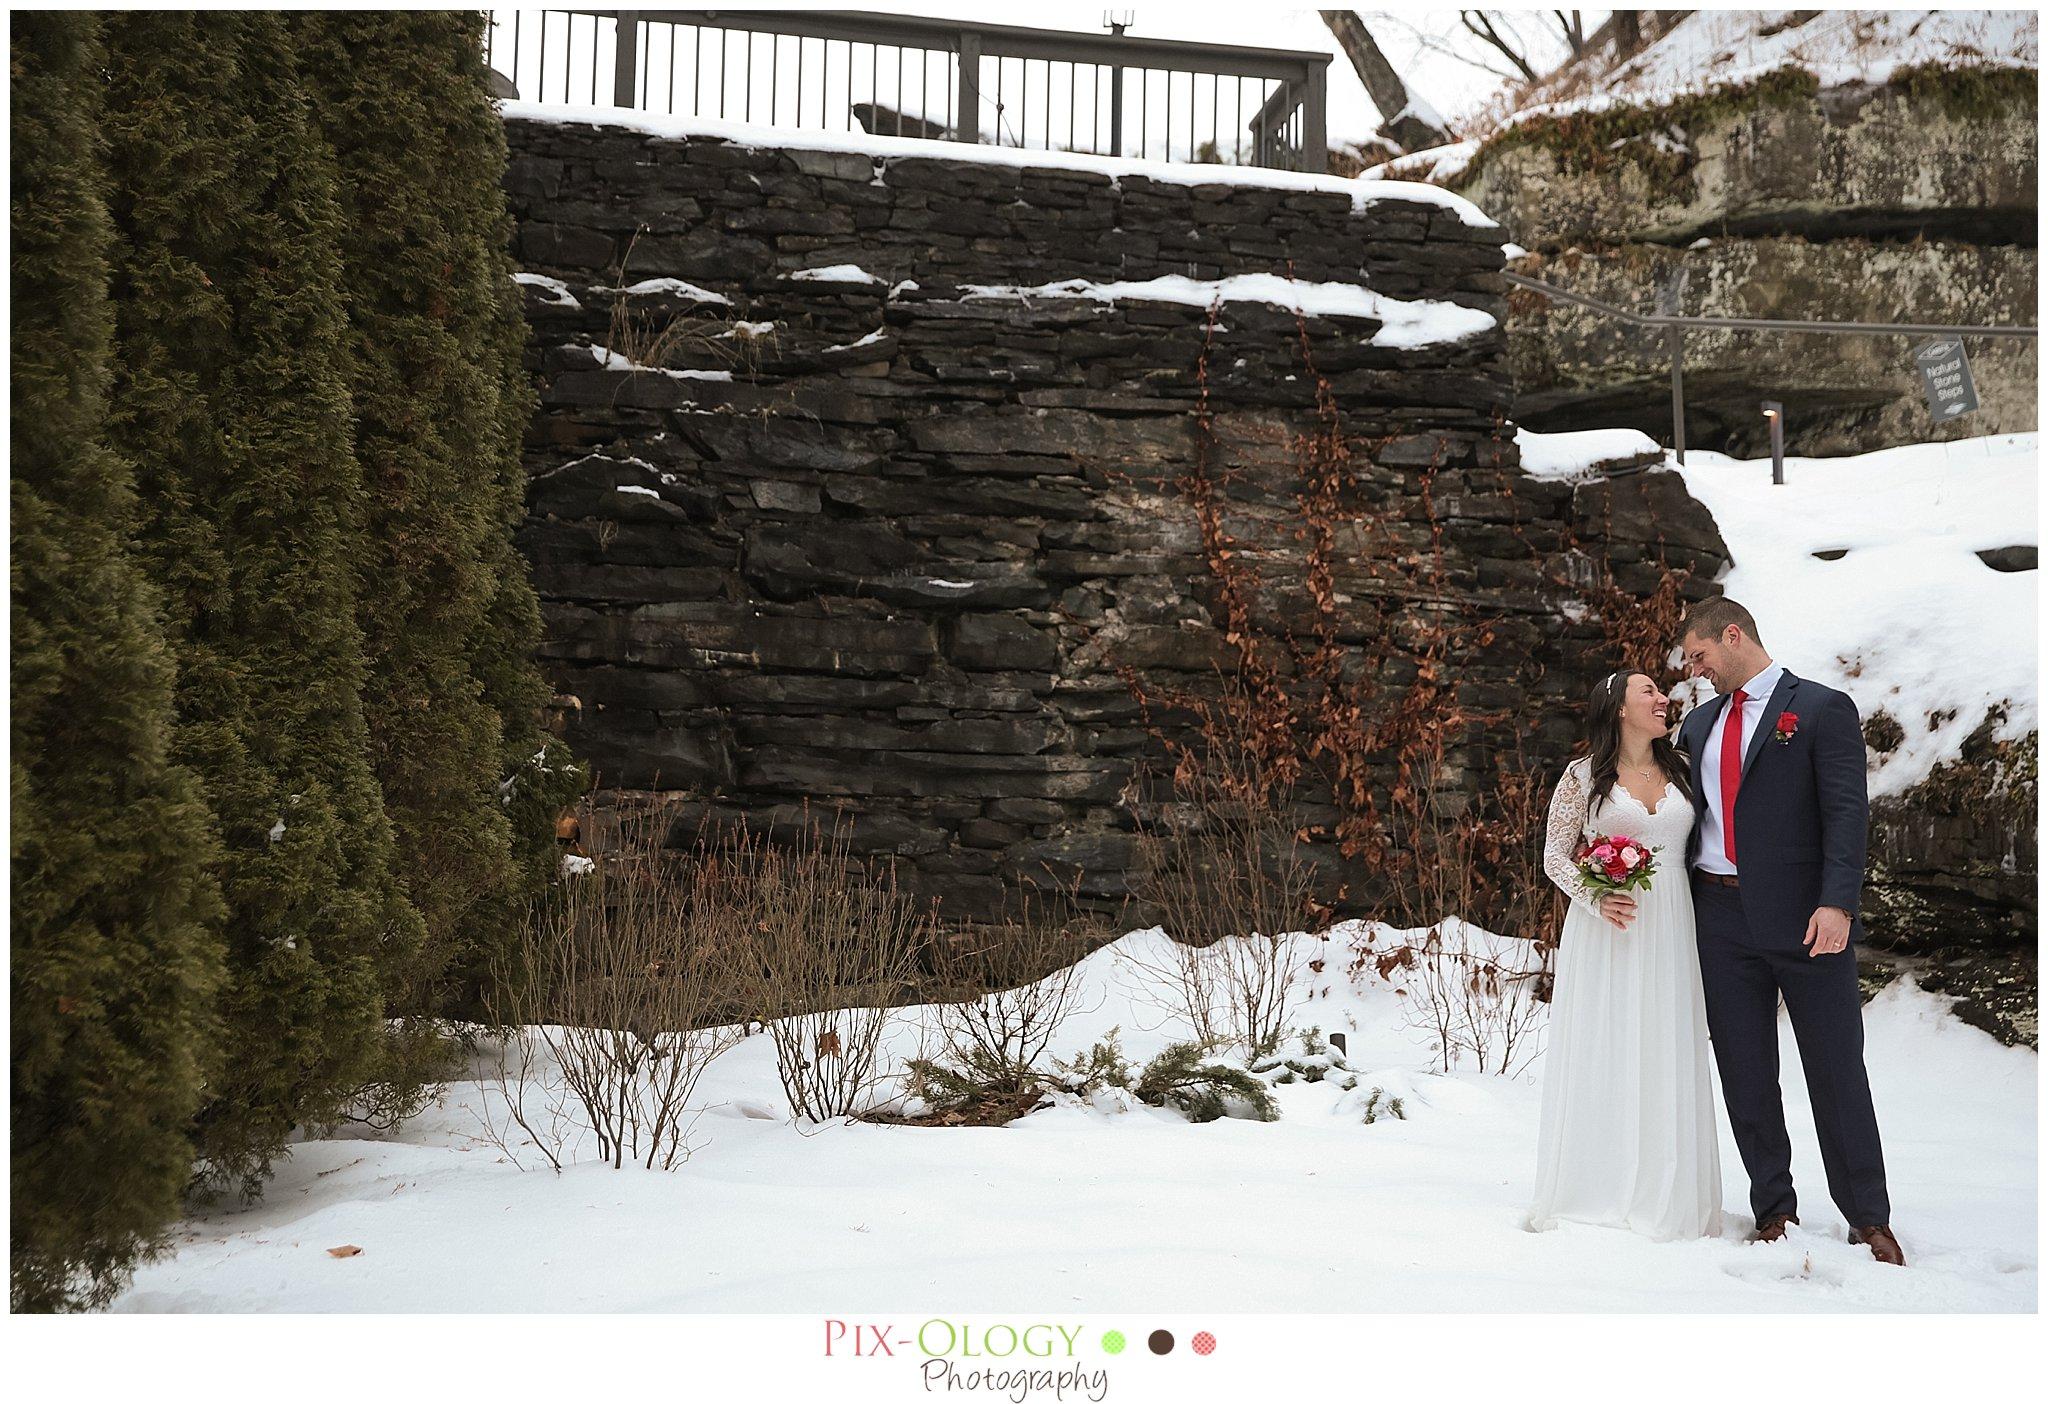 pix-ology-photography-winter-wedding-ledges-hotel-bride-groom